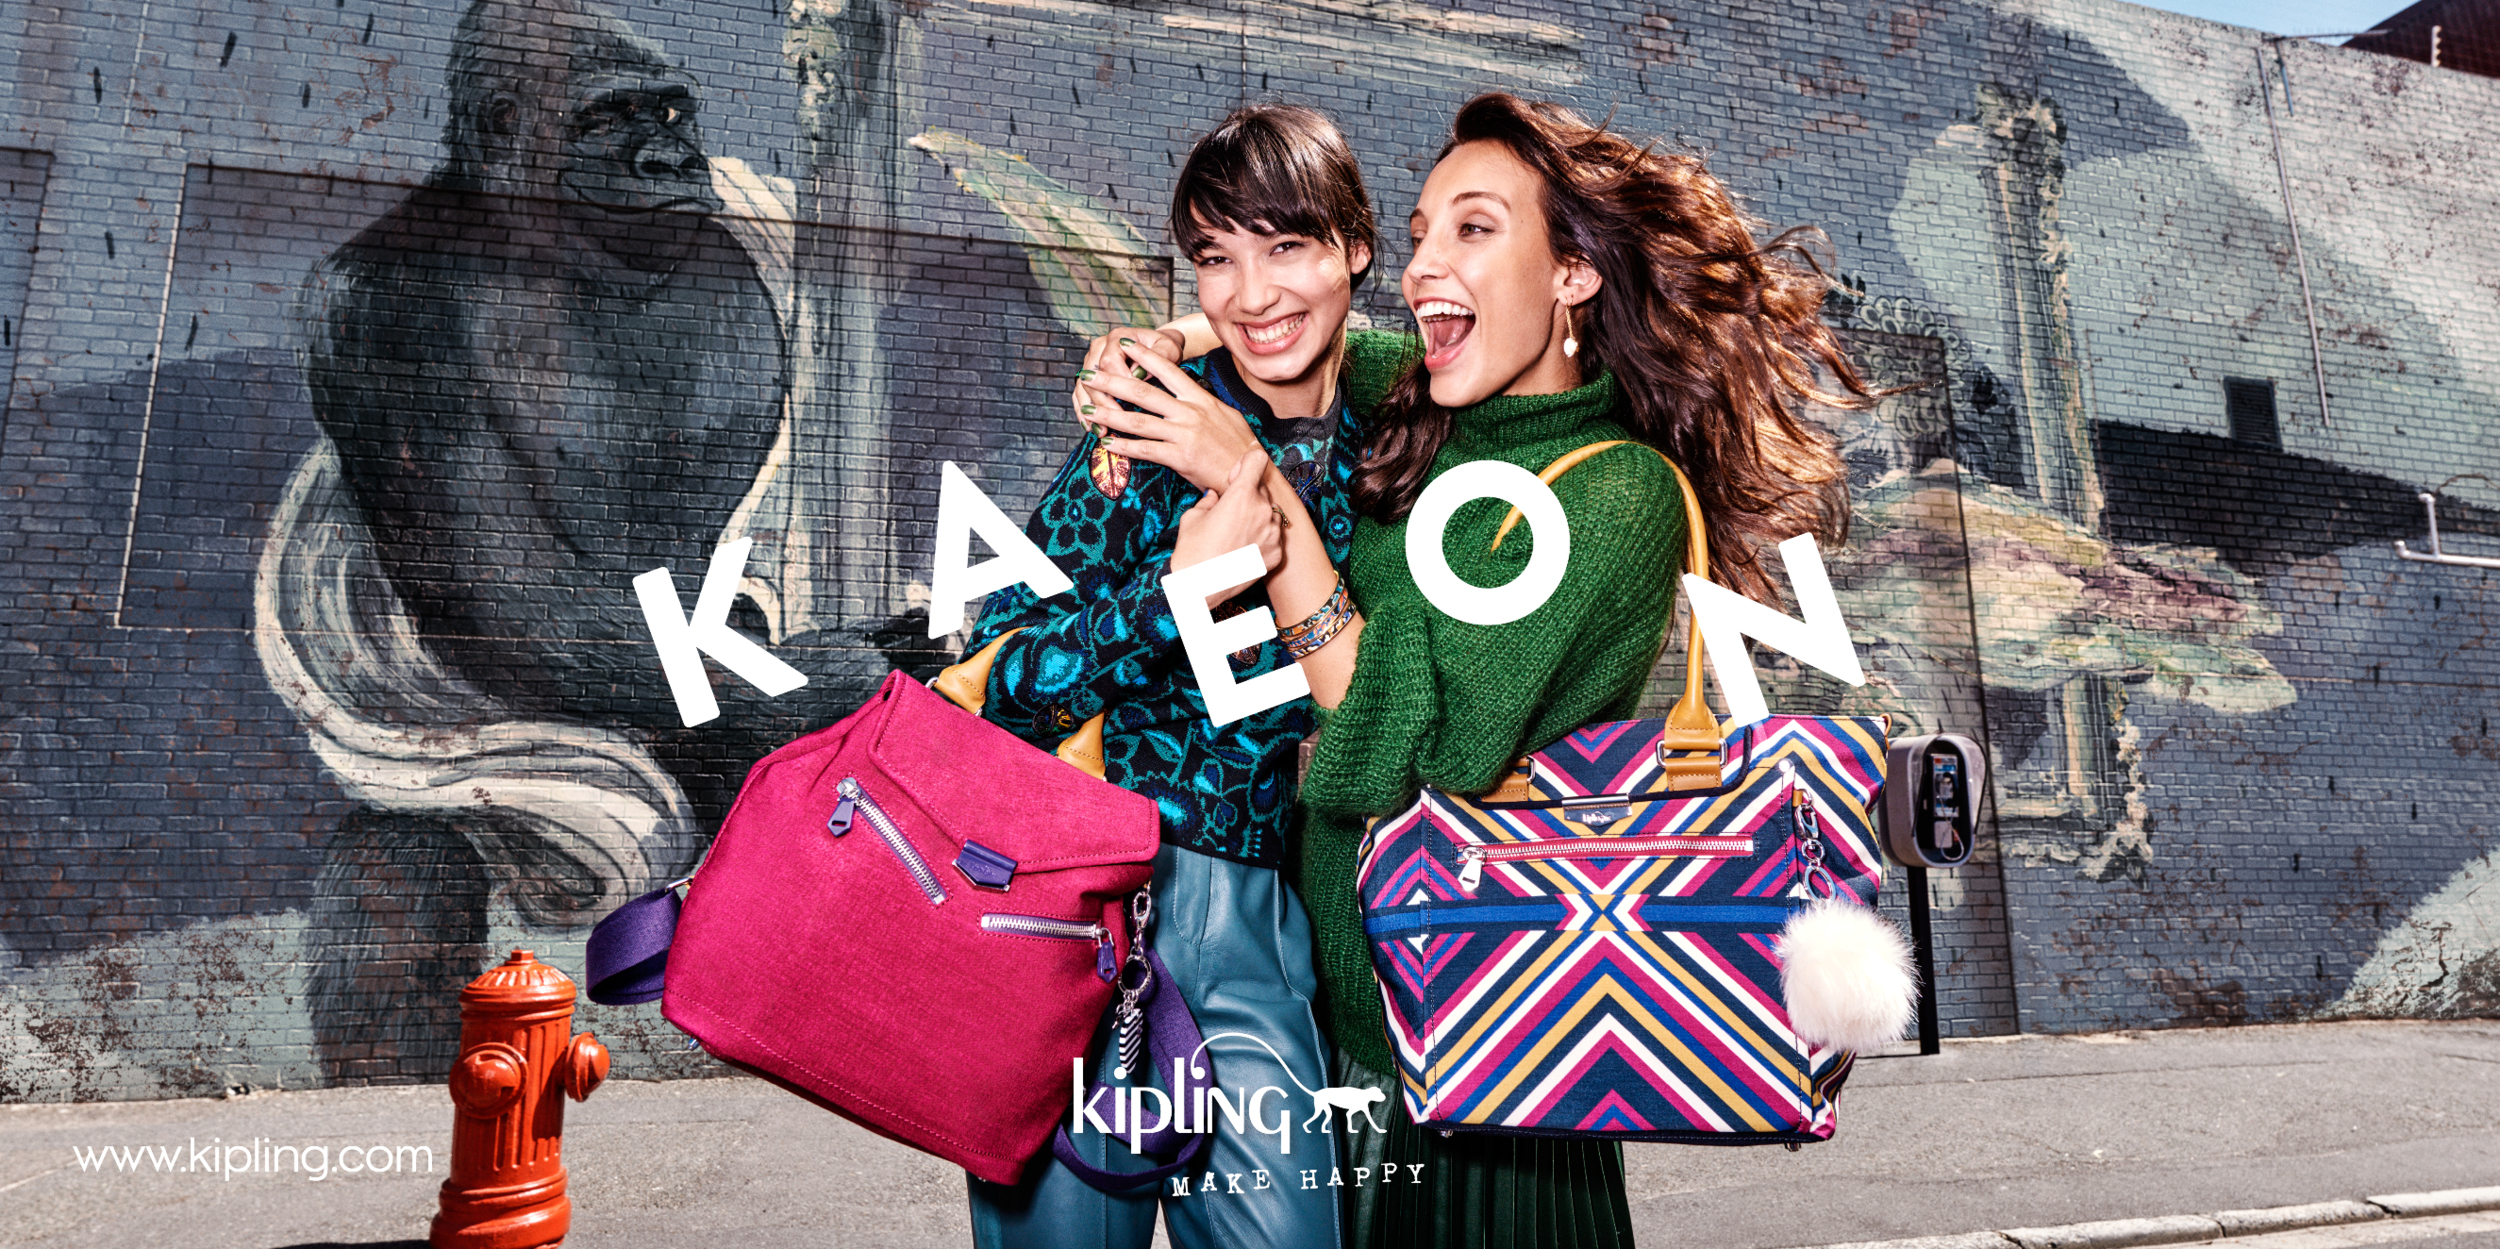 Kipling_KAEON.jpg